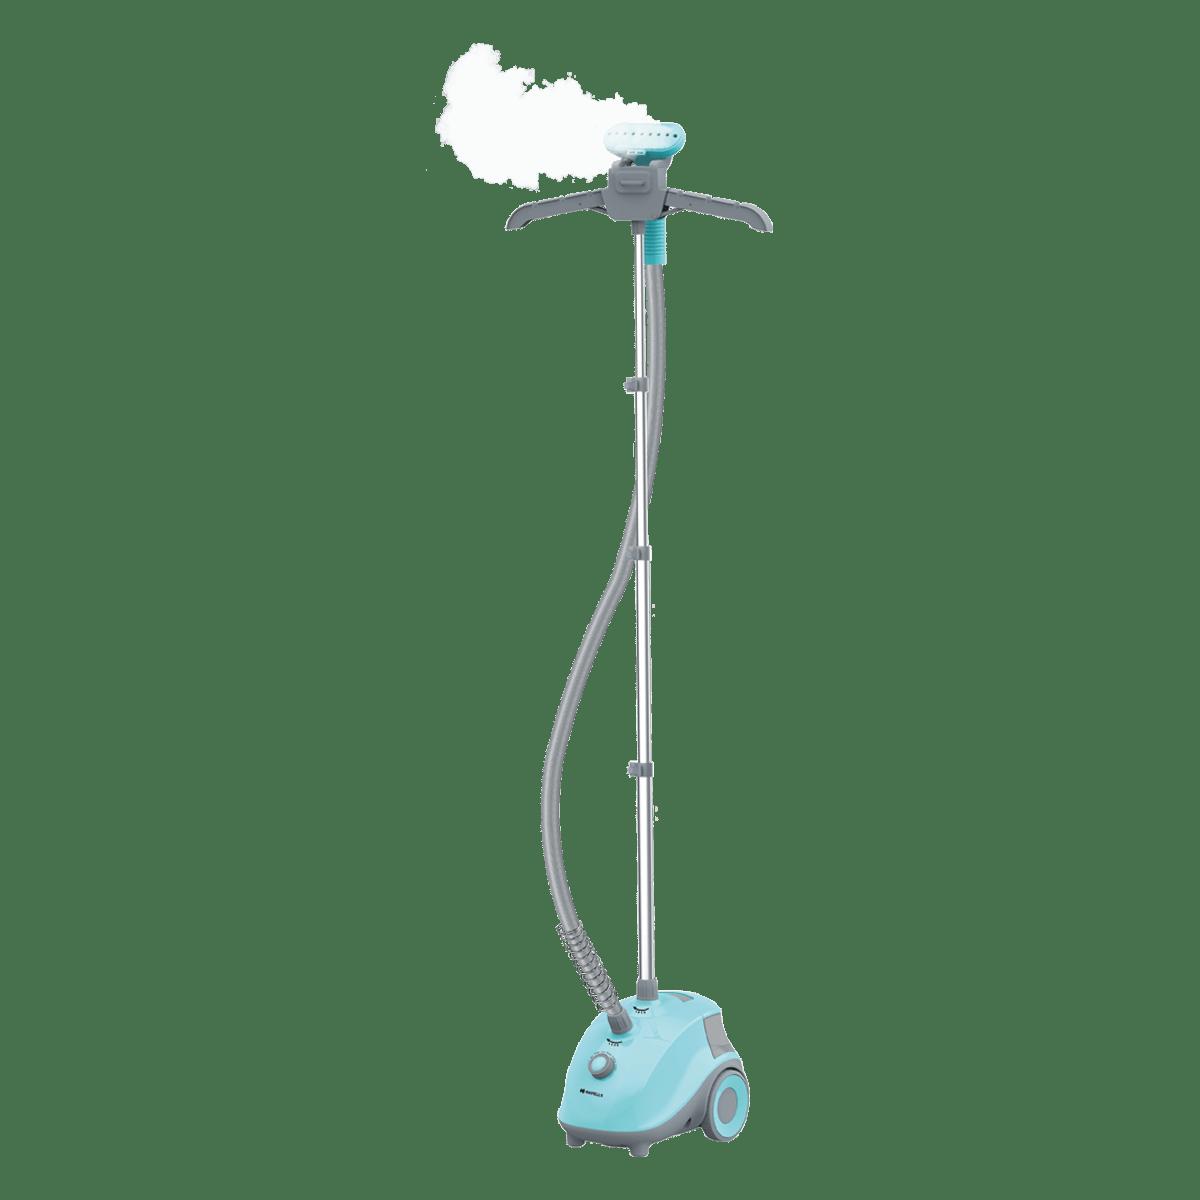 Havells Glanzo 1650 Watt Garment Steamer (GHGGSBRB165, Blue)